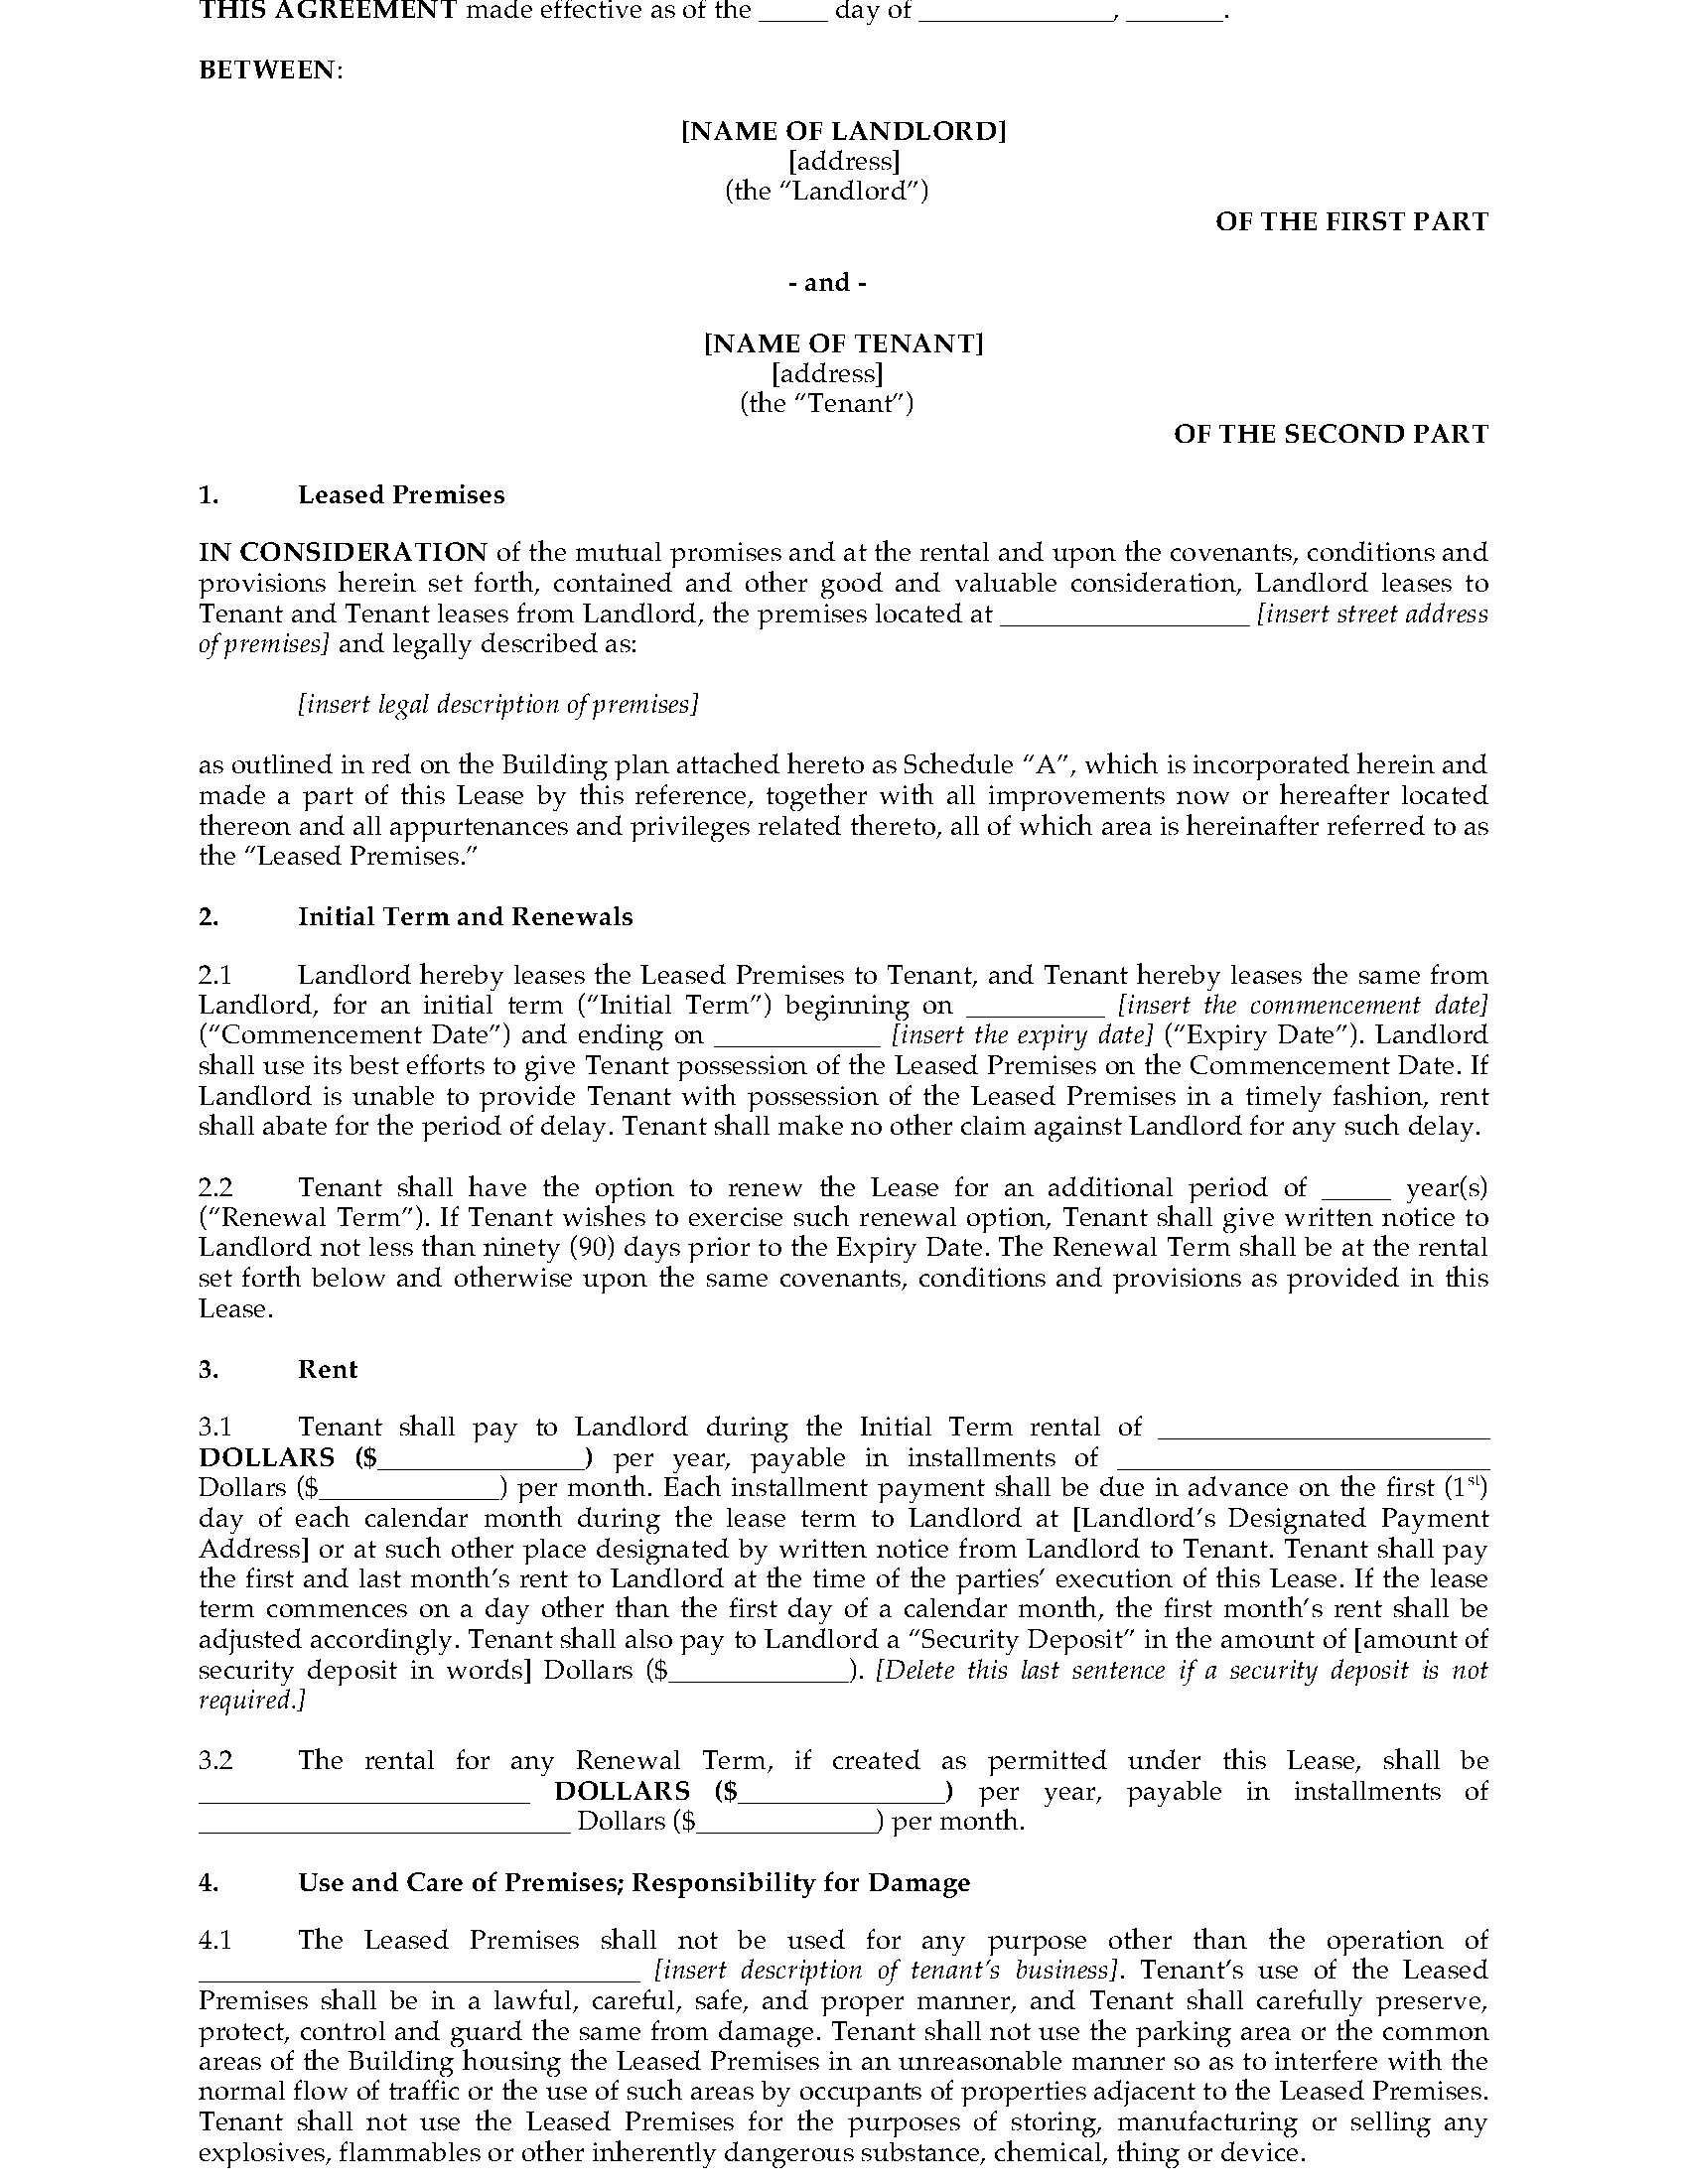 Alberta Landlord Tenant Act Commercial Property Property Walls